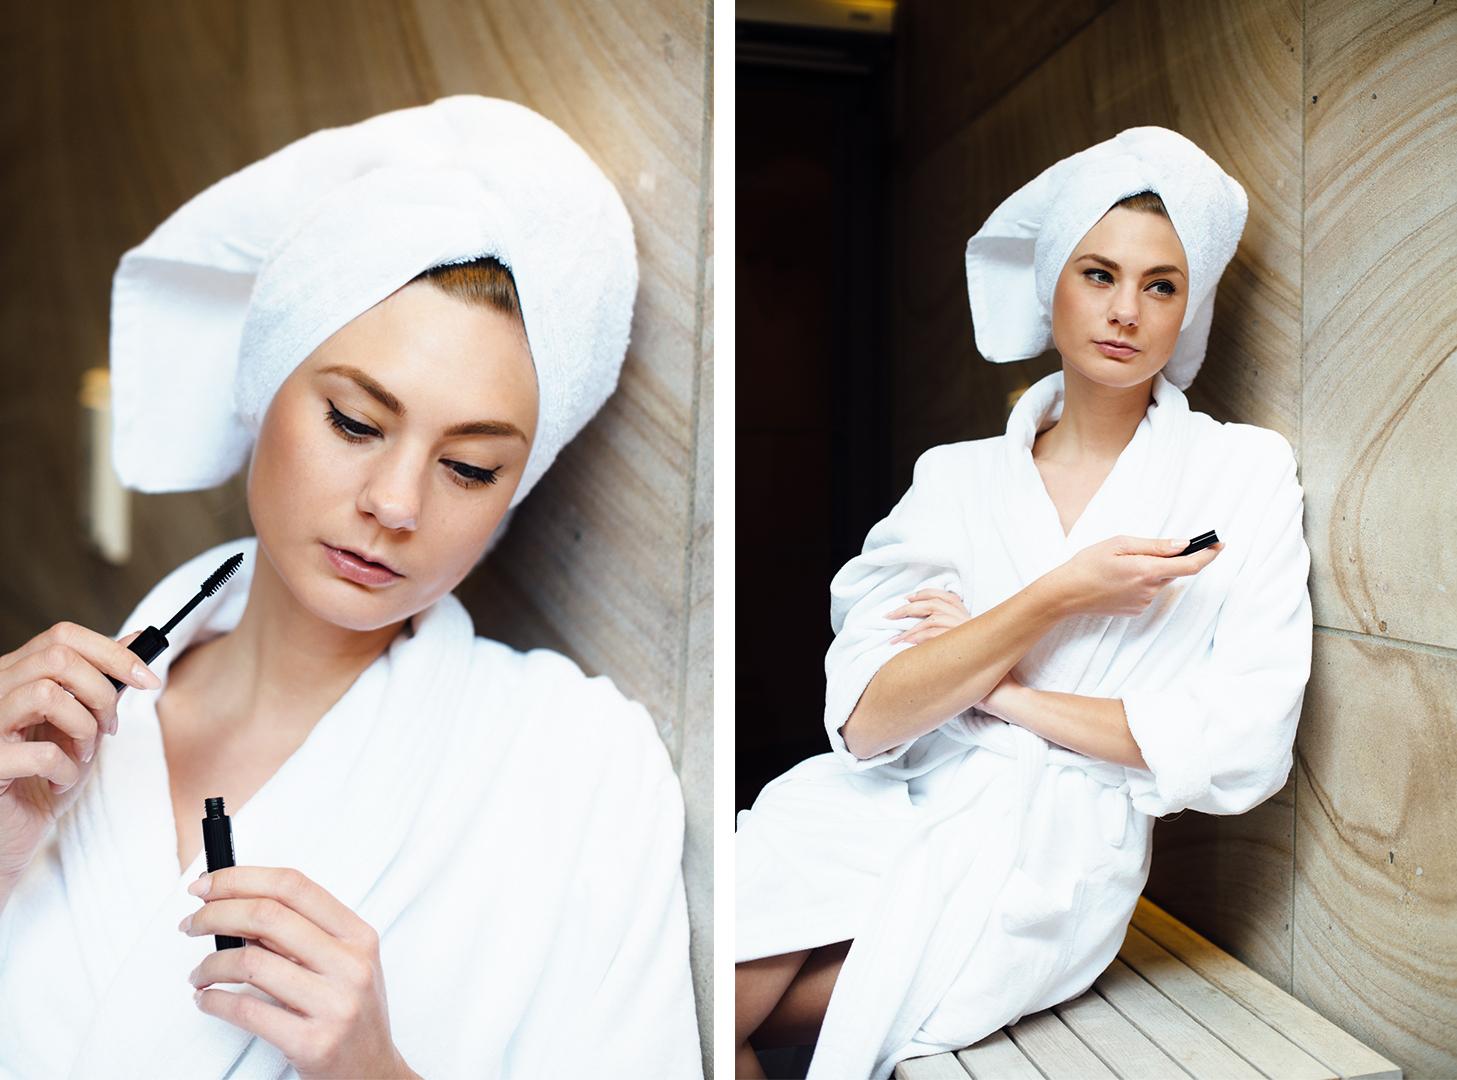 Kiamisu_Modeblog_Fashionblog_medipharma cosmetics_Mascara Med_Wimpern Booster_Erfahrungen_Test_Review-final-7